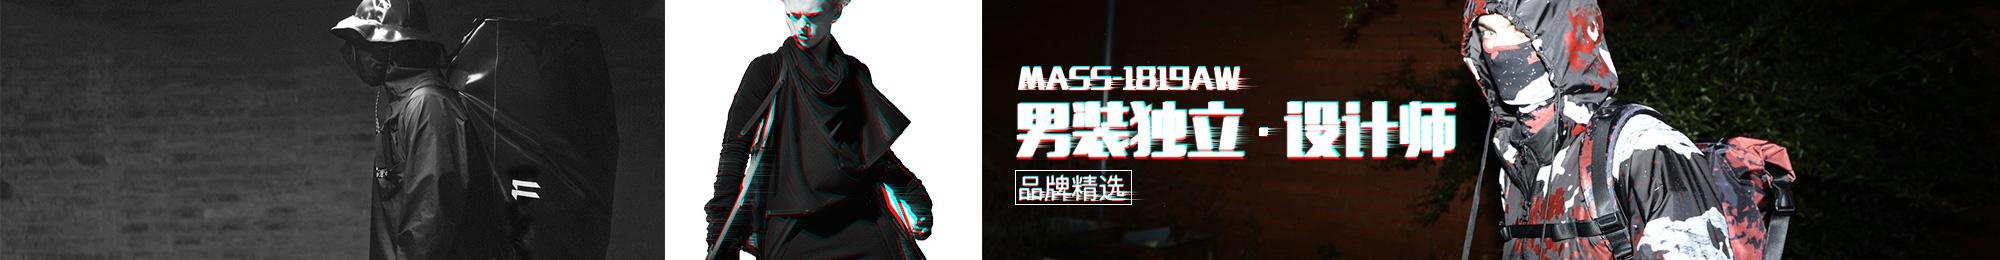 MASS-1819AW男装独立设计师品牌精选